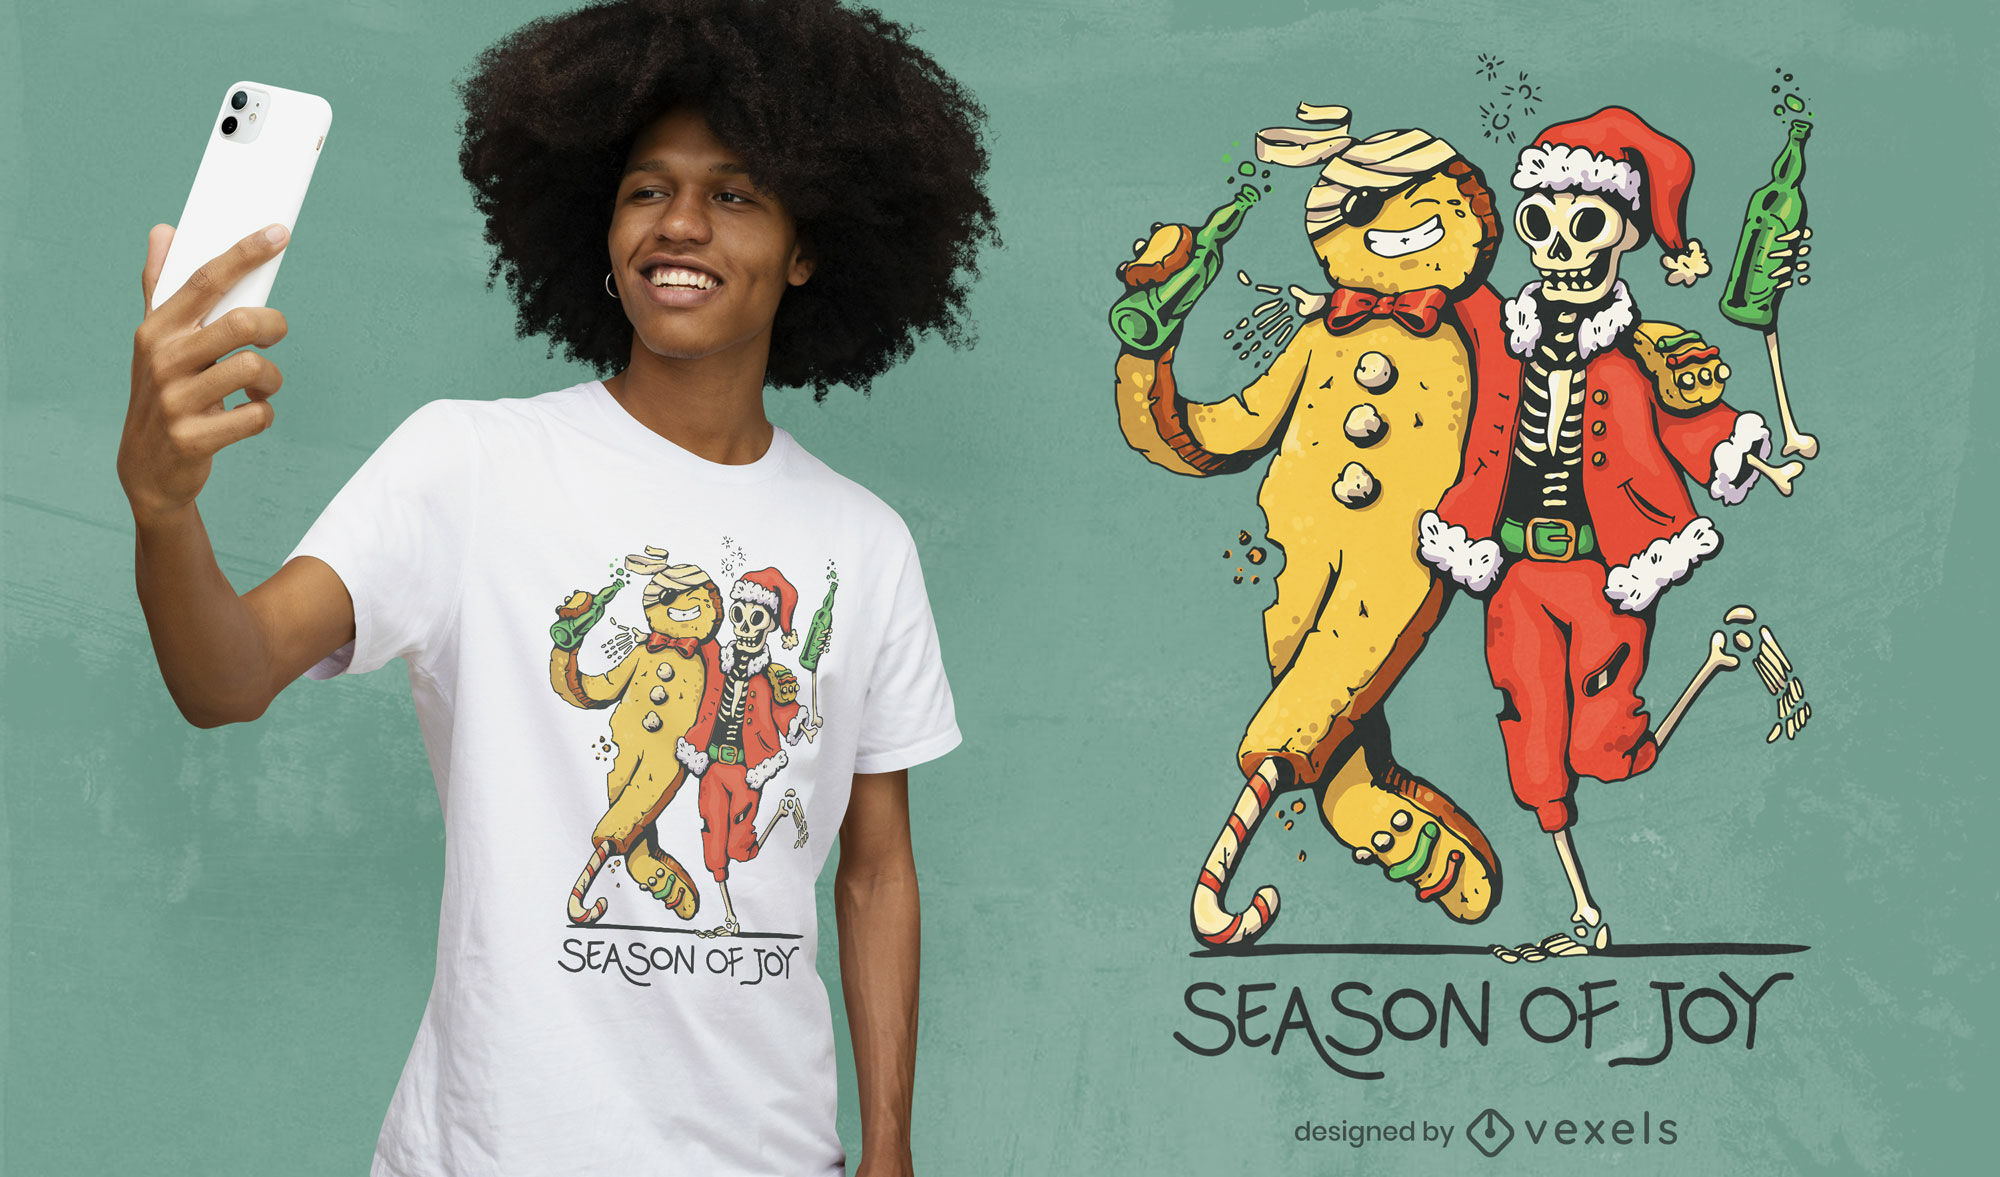 Genial diseño de camiseta de esqueleto anti navideño.